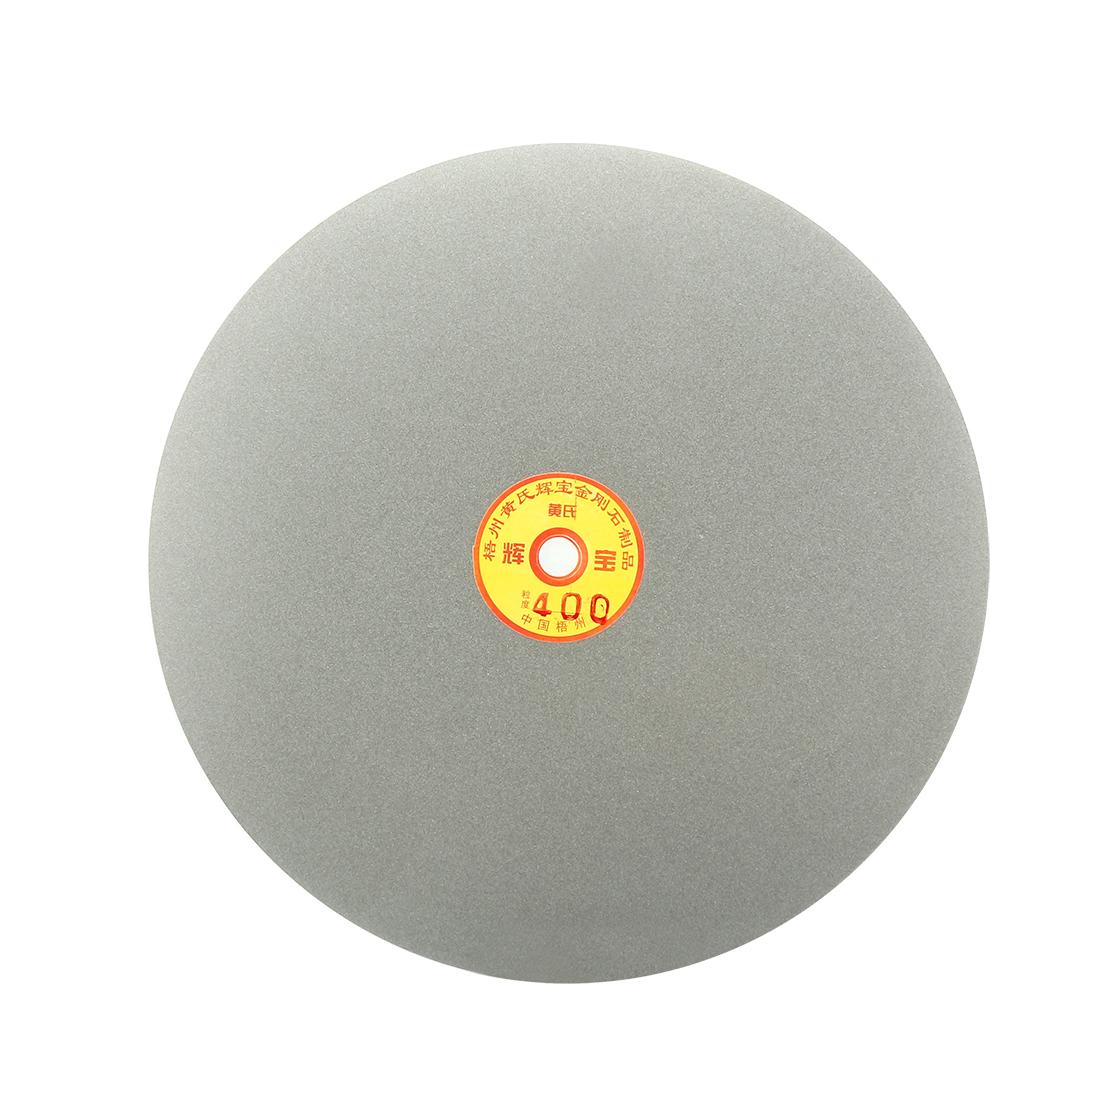 250mm 10-inch Grit 400 Diamond Coated Flat Lap Disk Wheel Grinding Sanding Disc